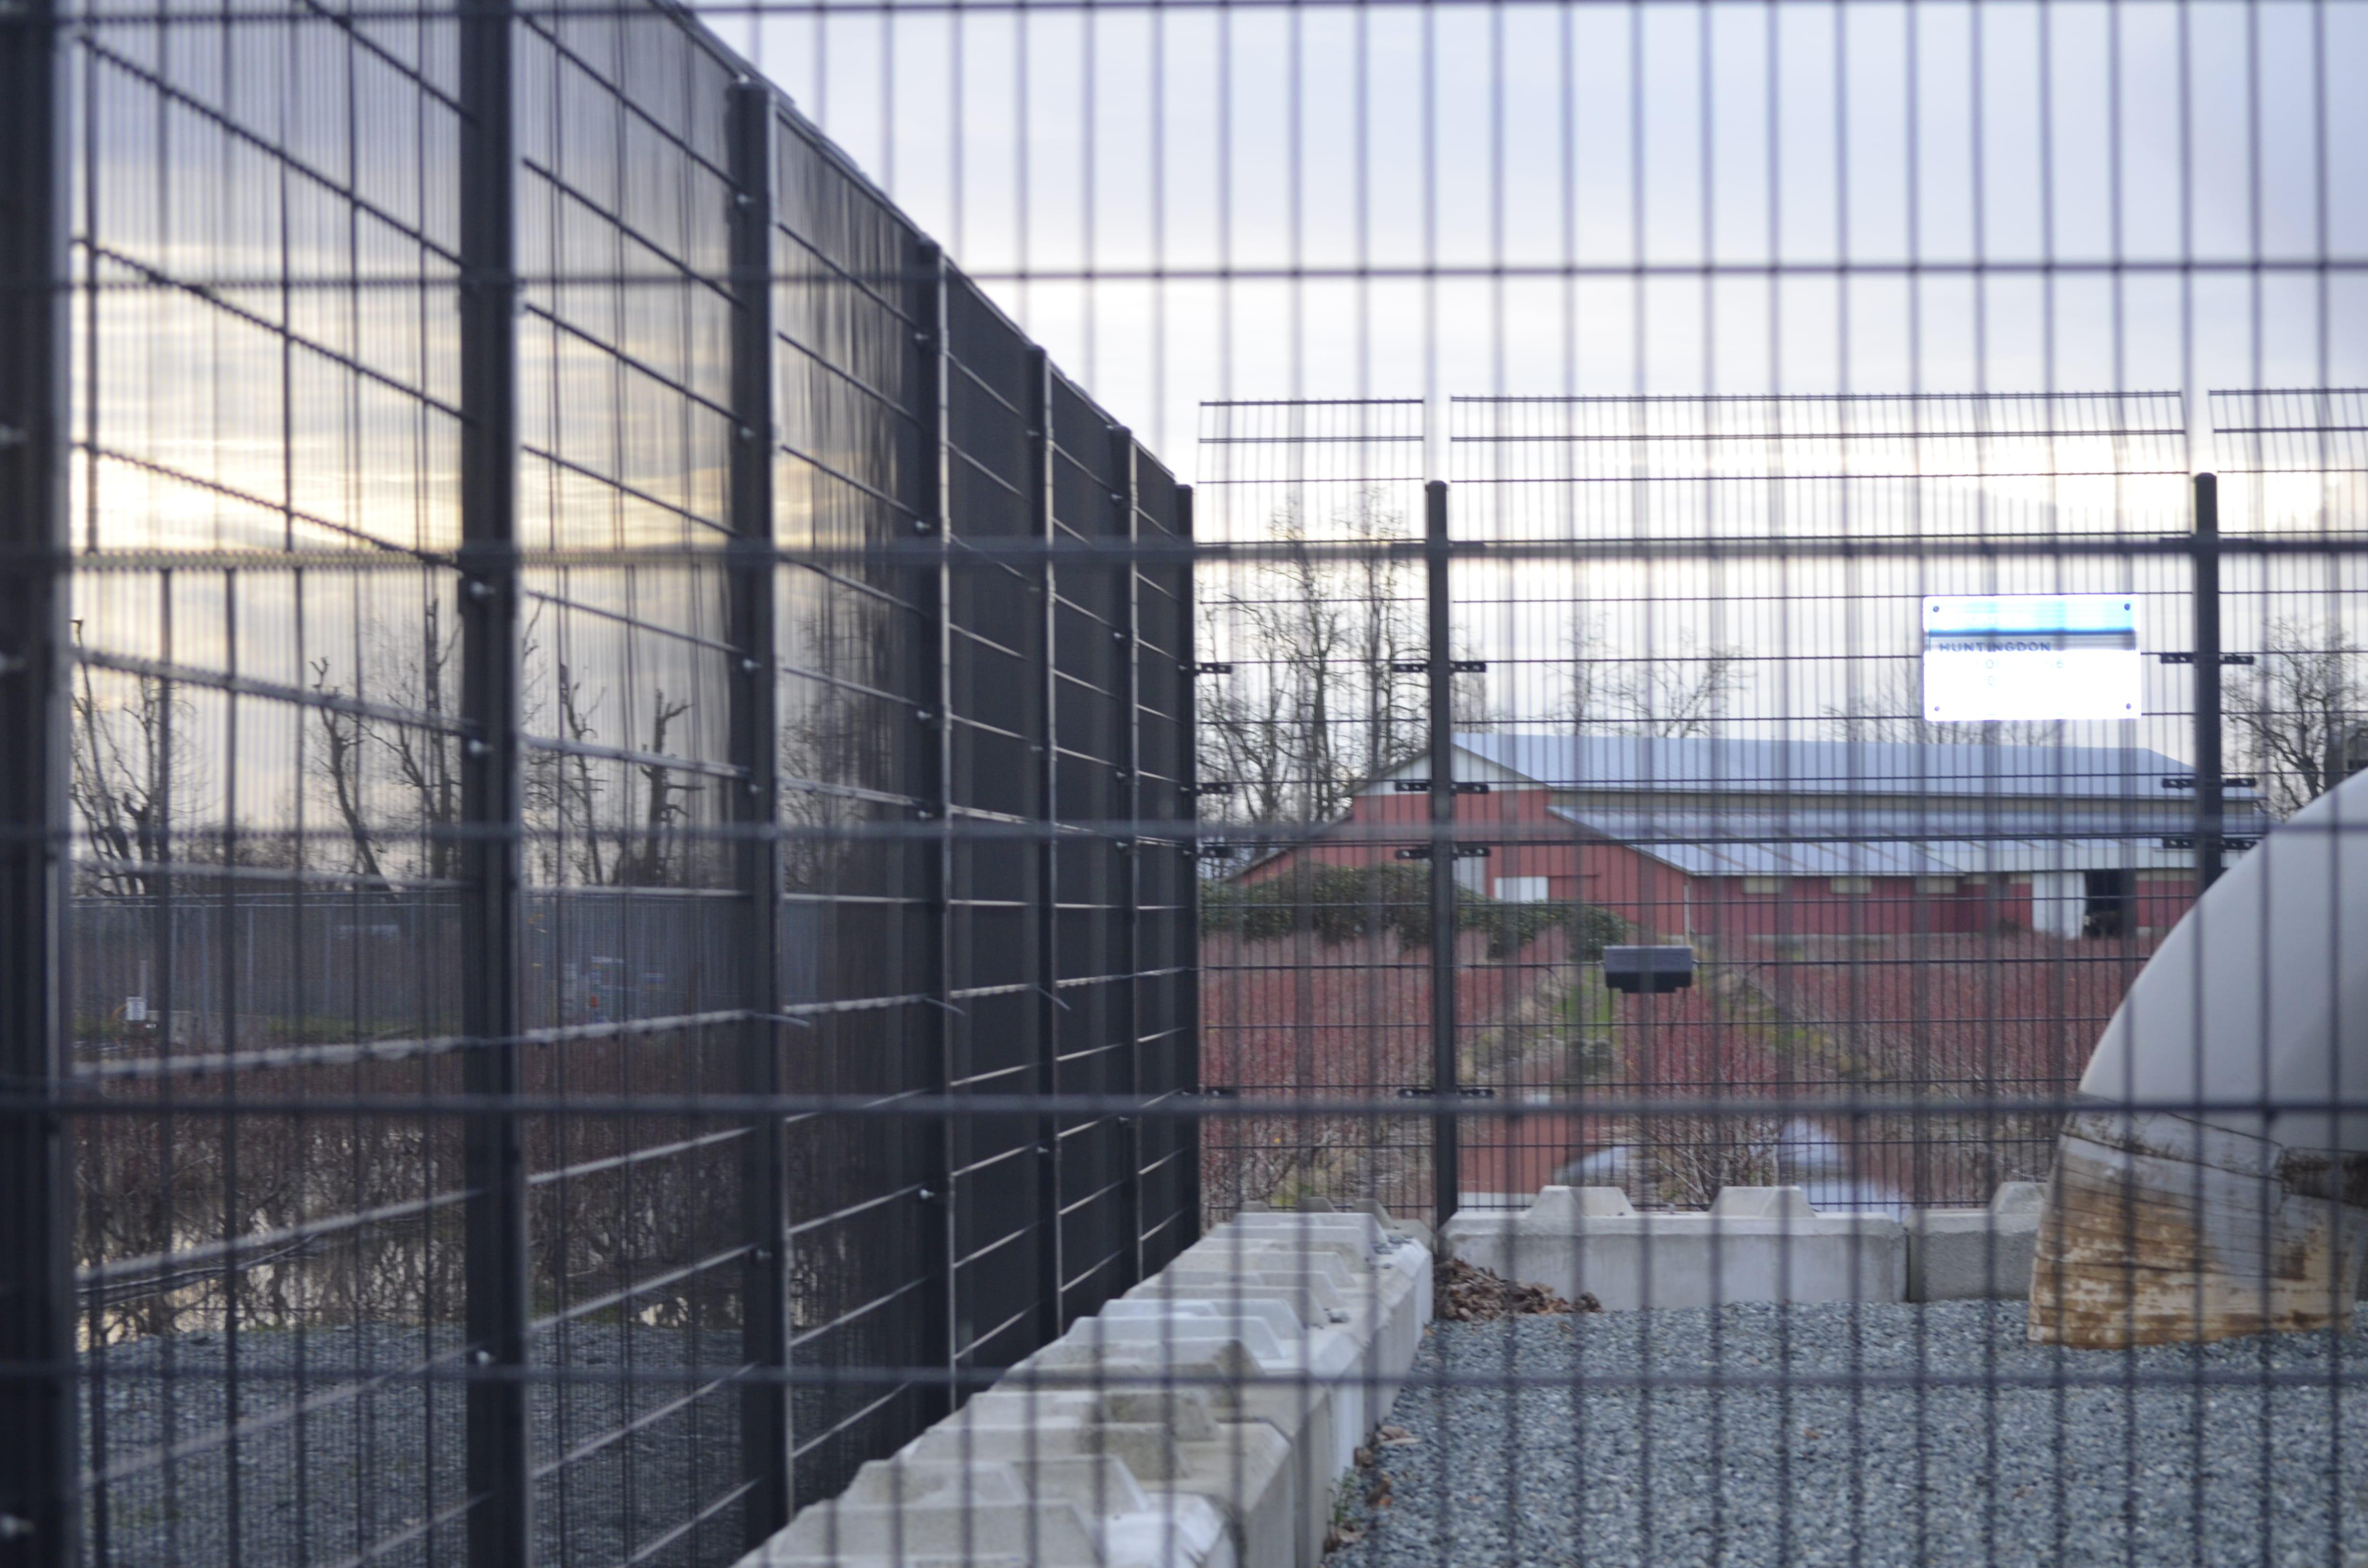 Fences Showcase Vulcan Metal Work